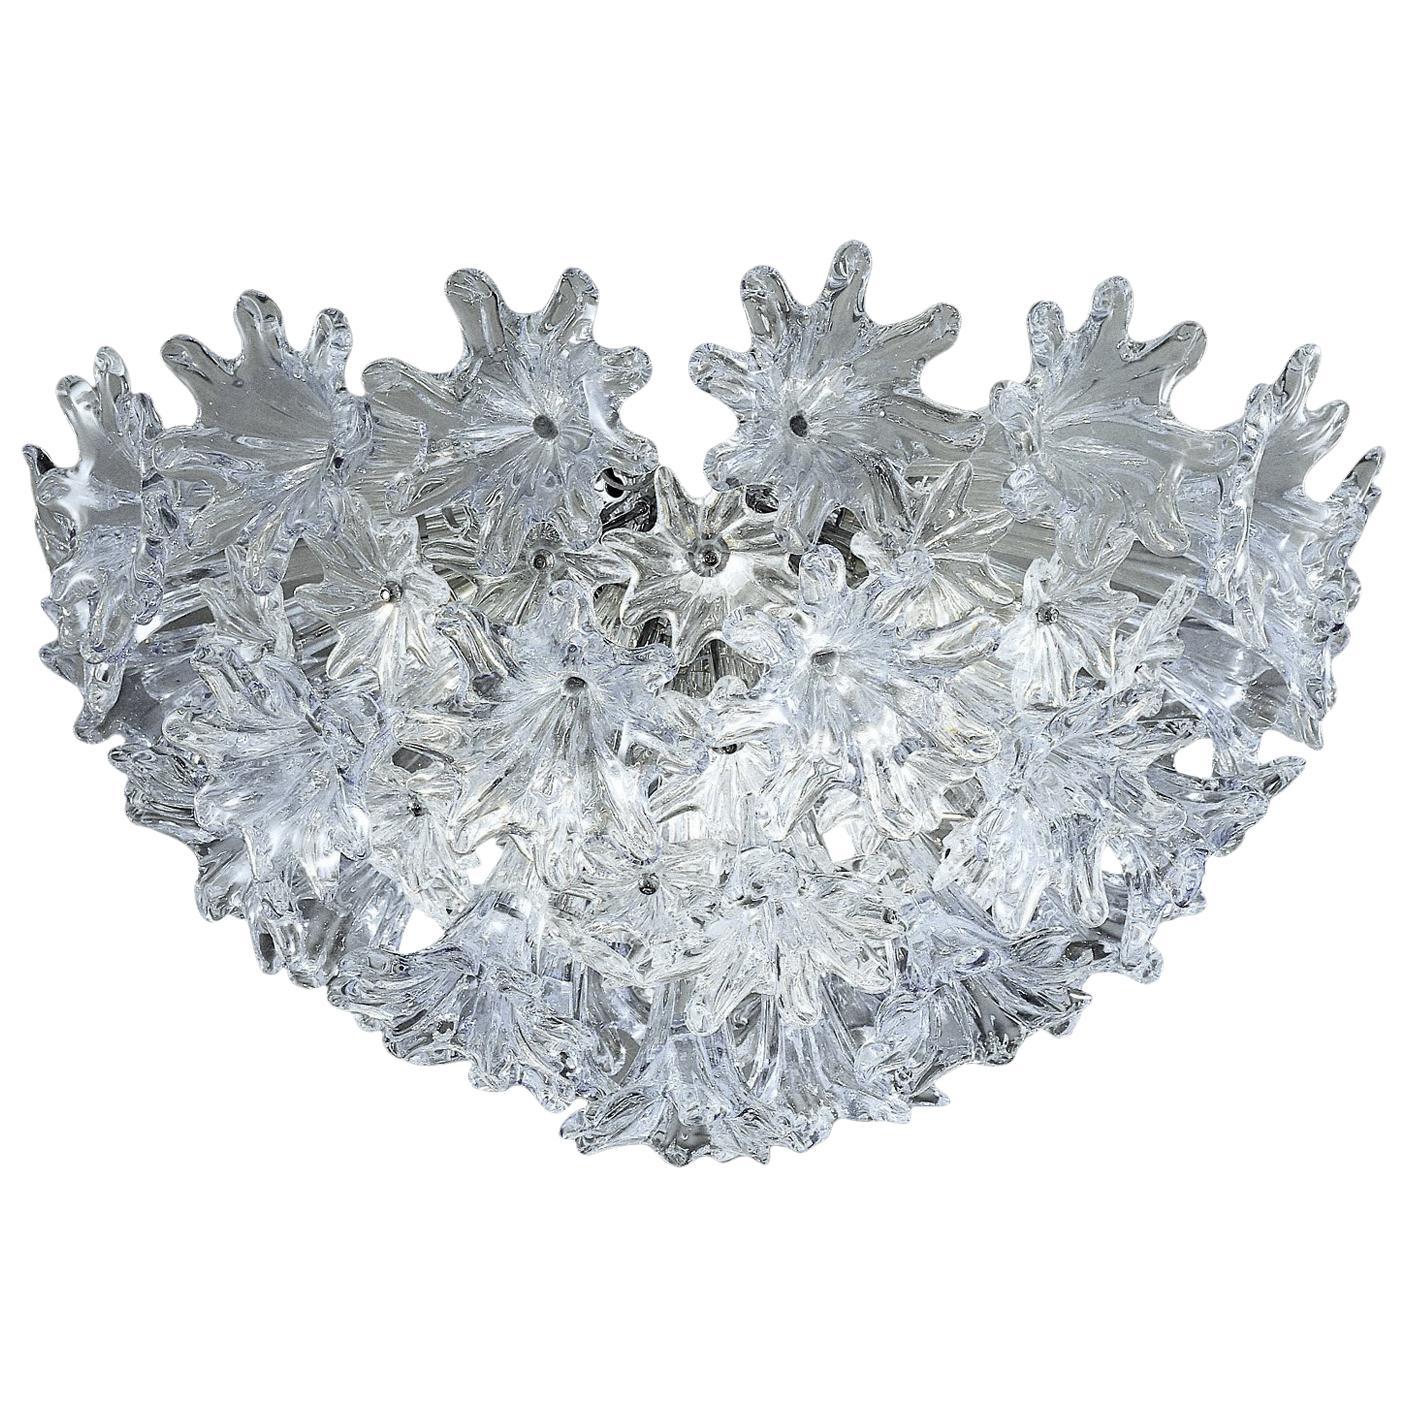 Venini Esprit Wall Light in Crystal